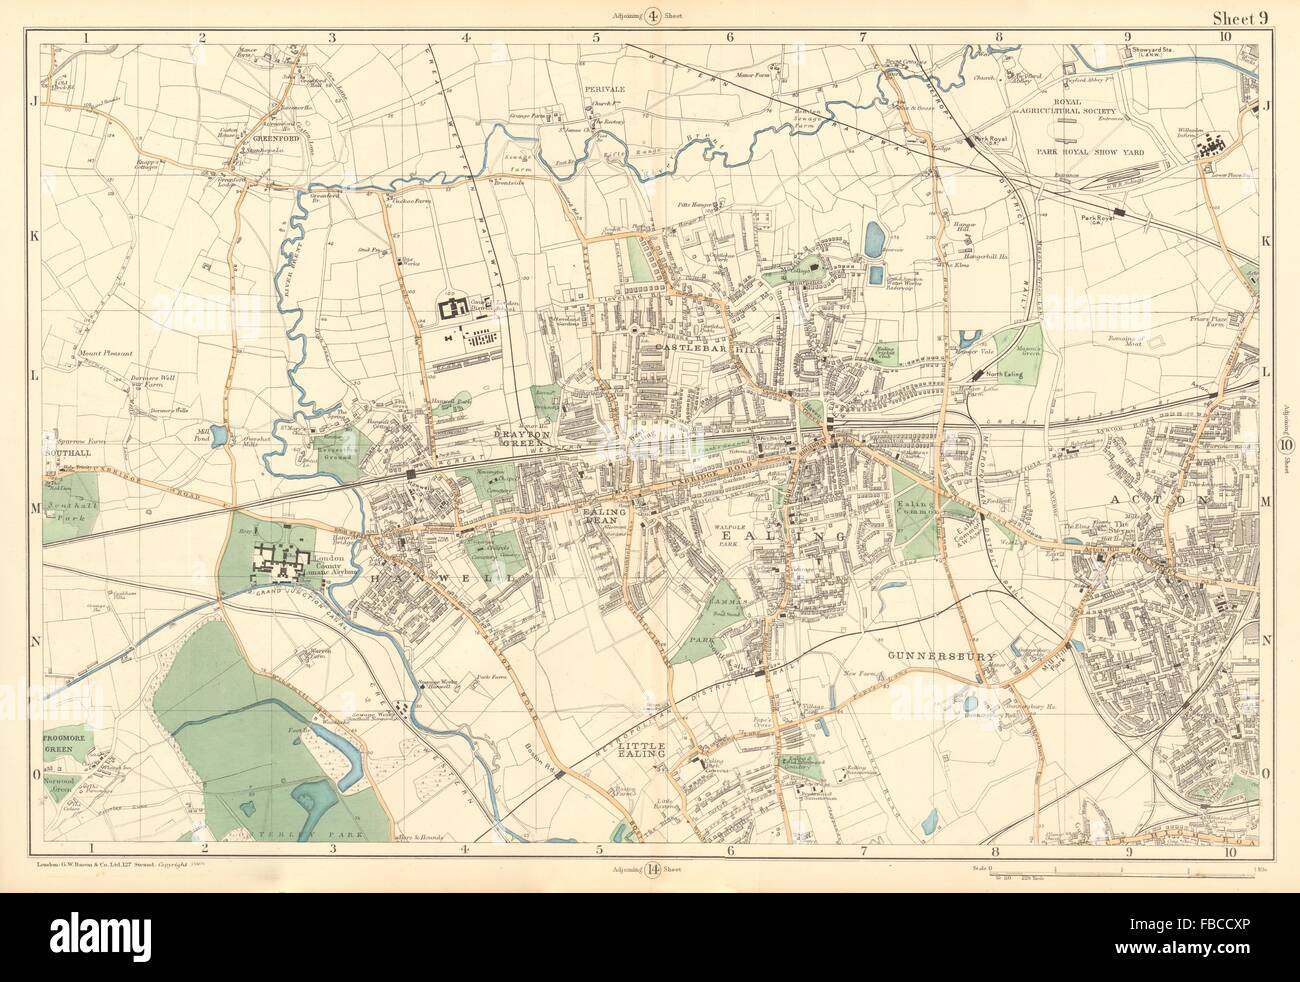 EALING ACTON Greenford Hanwell Gunnersbury Perivale Hanger Lane BACON 1903 Map